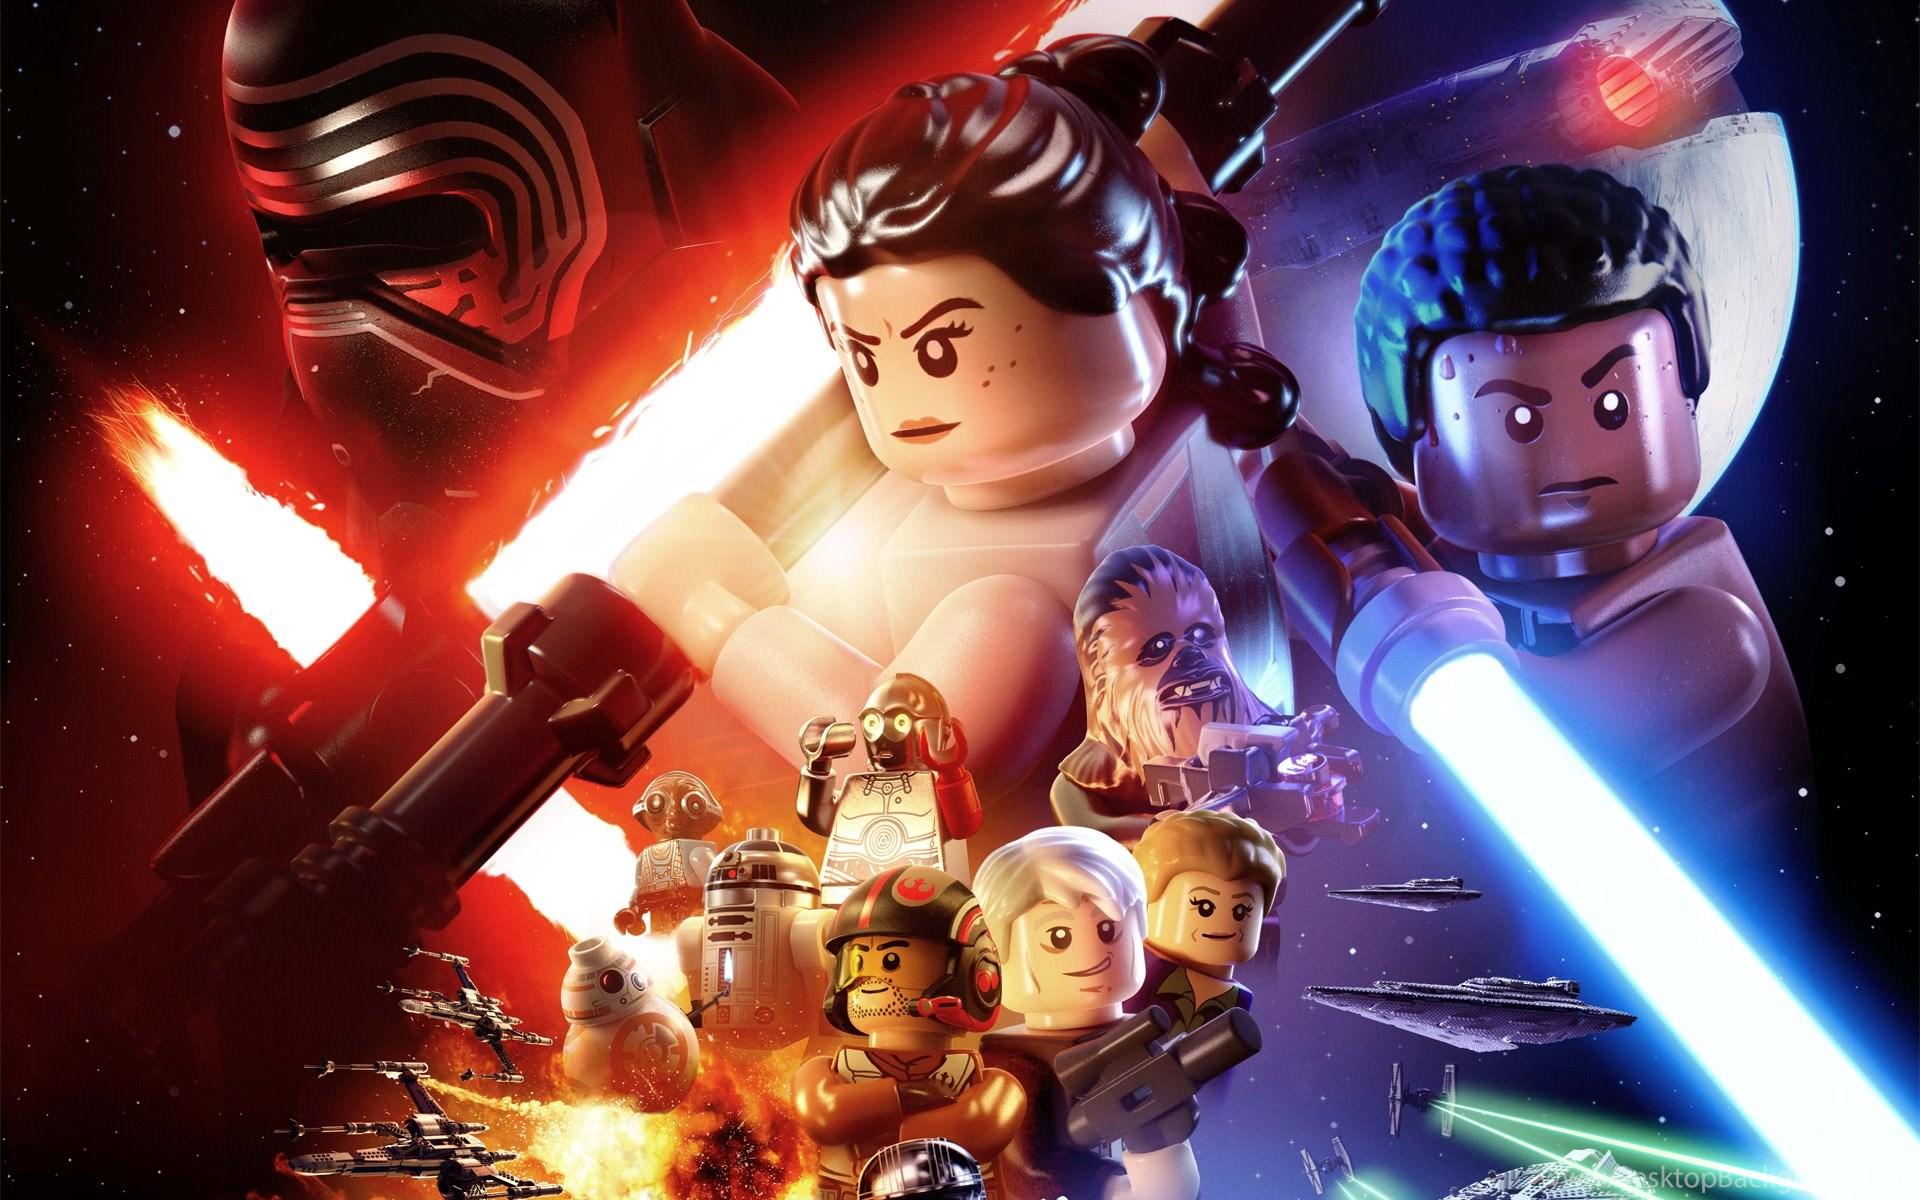 1 Lego Star Wars The Force Awakens Hd Wallpapers Desktop Background